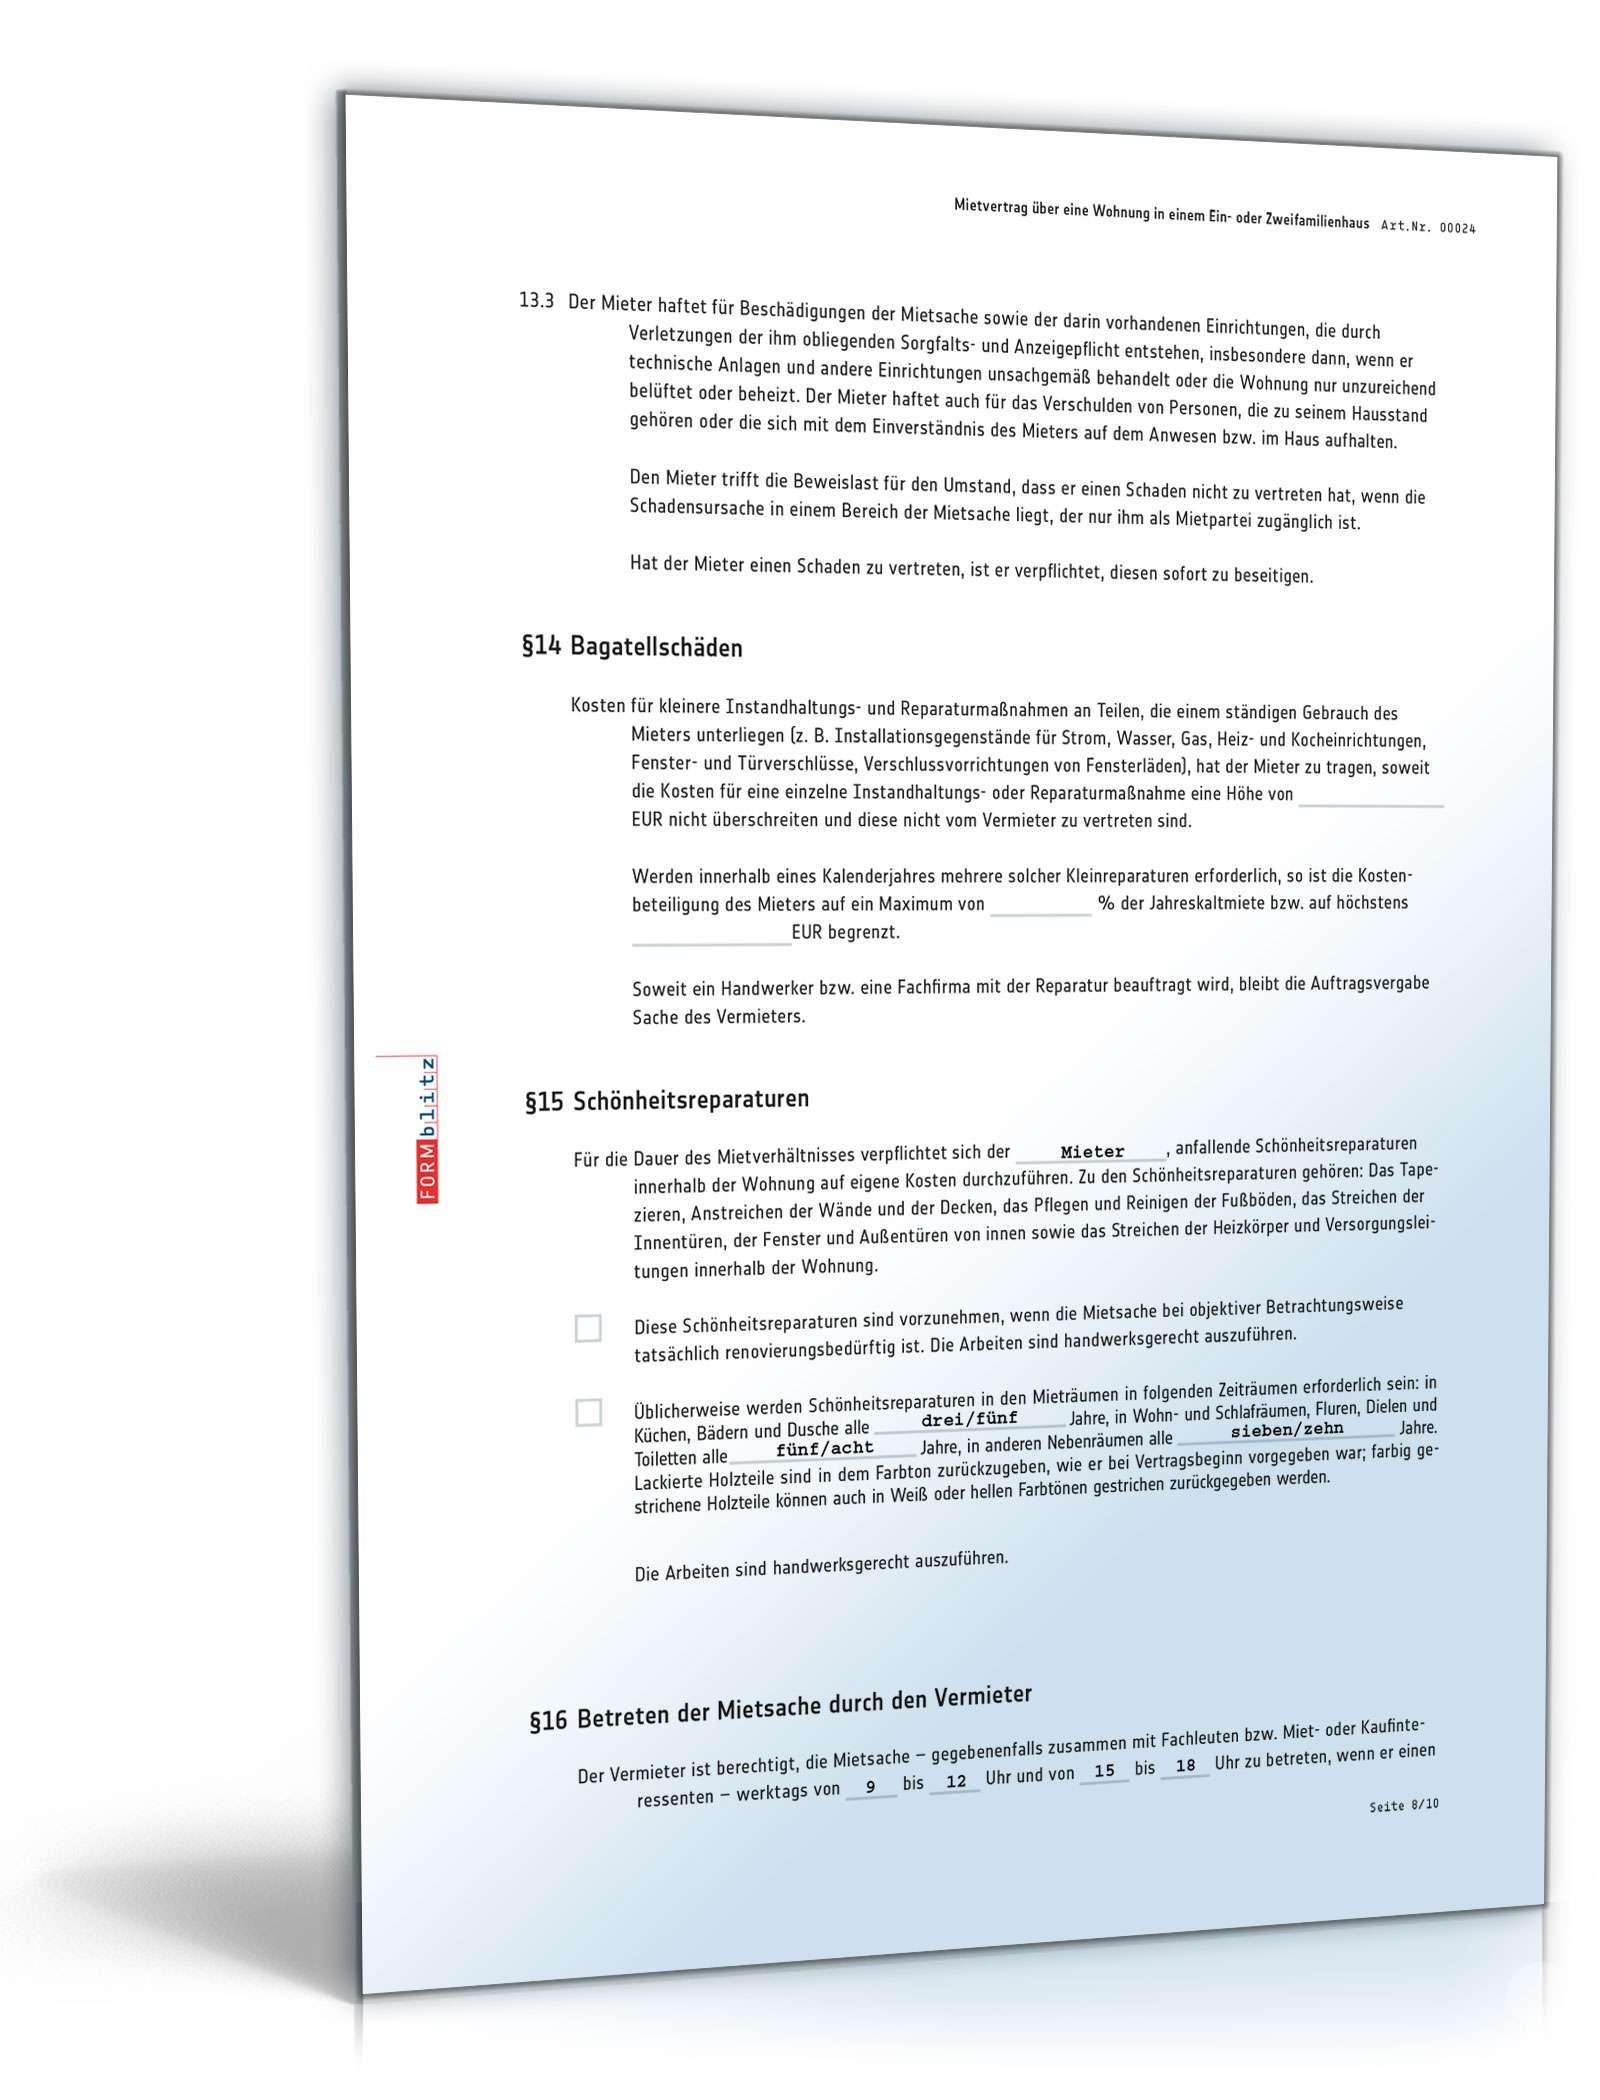 Charmant Blank Mietvertrag Bilder - FORTSETZUNG ARBEITSBLATT ...